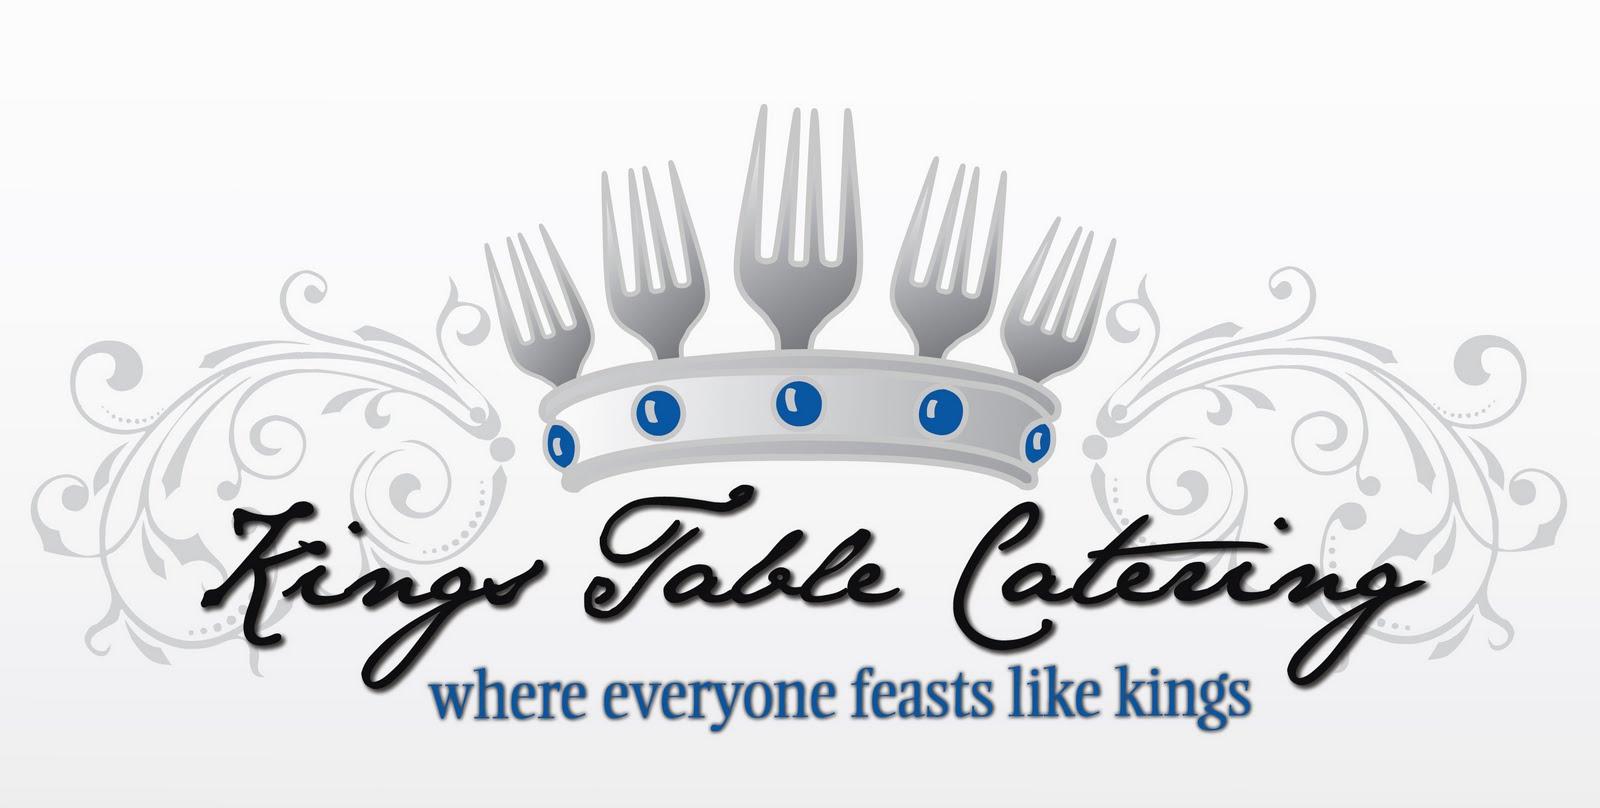 Tatum Criner McWatters Portfolio Kings Table Catering - Kings table catering